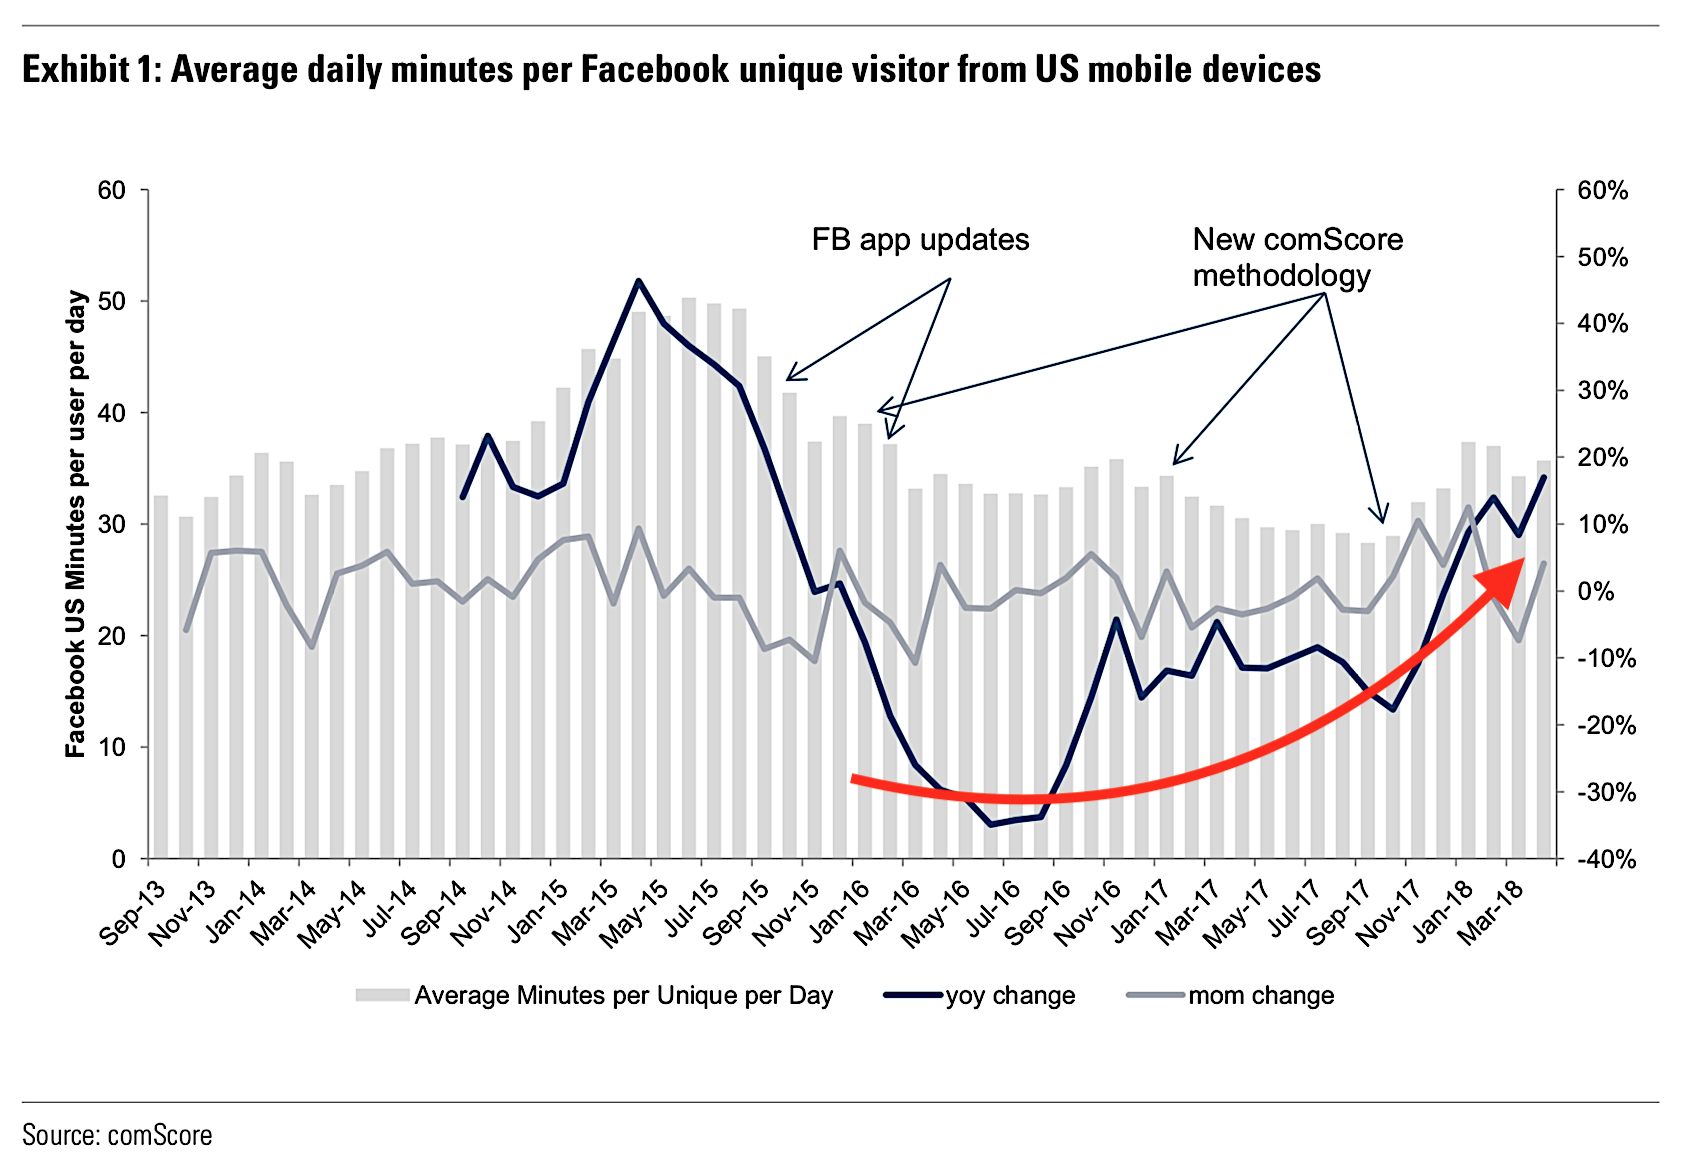 facebook-minutes-per-user-2018